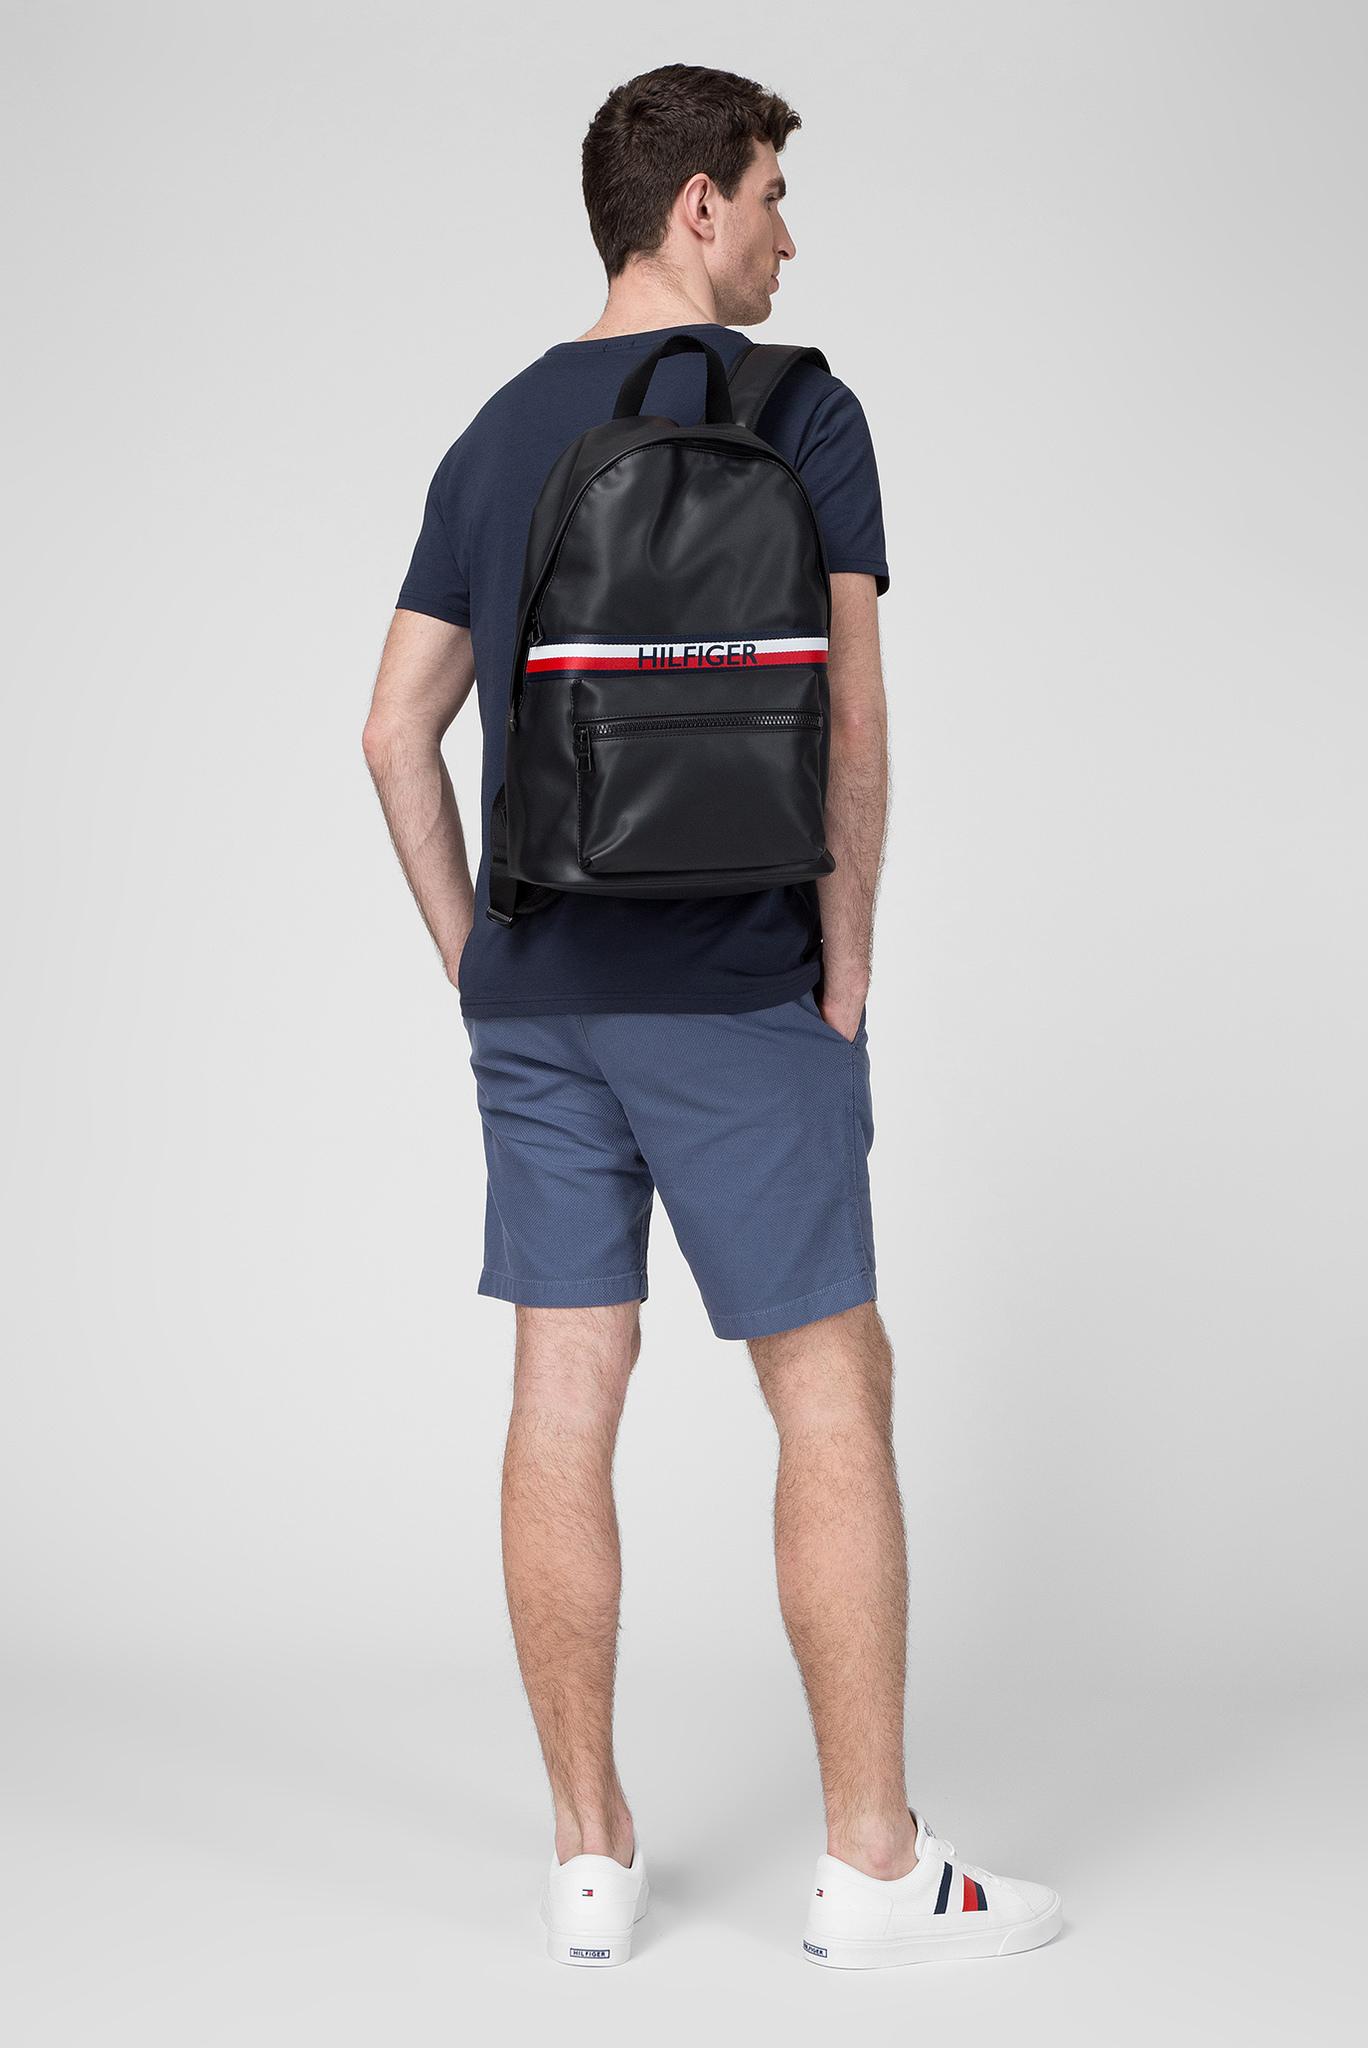 Мужской черный рюкзак URBAN PU BACKPACK Tommy Hilfiger